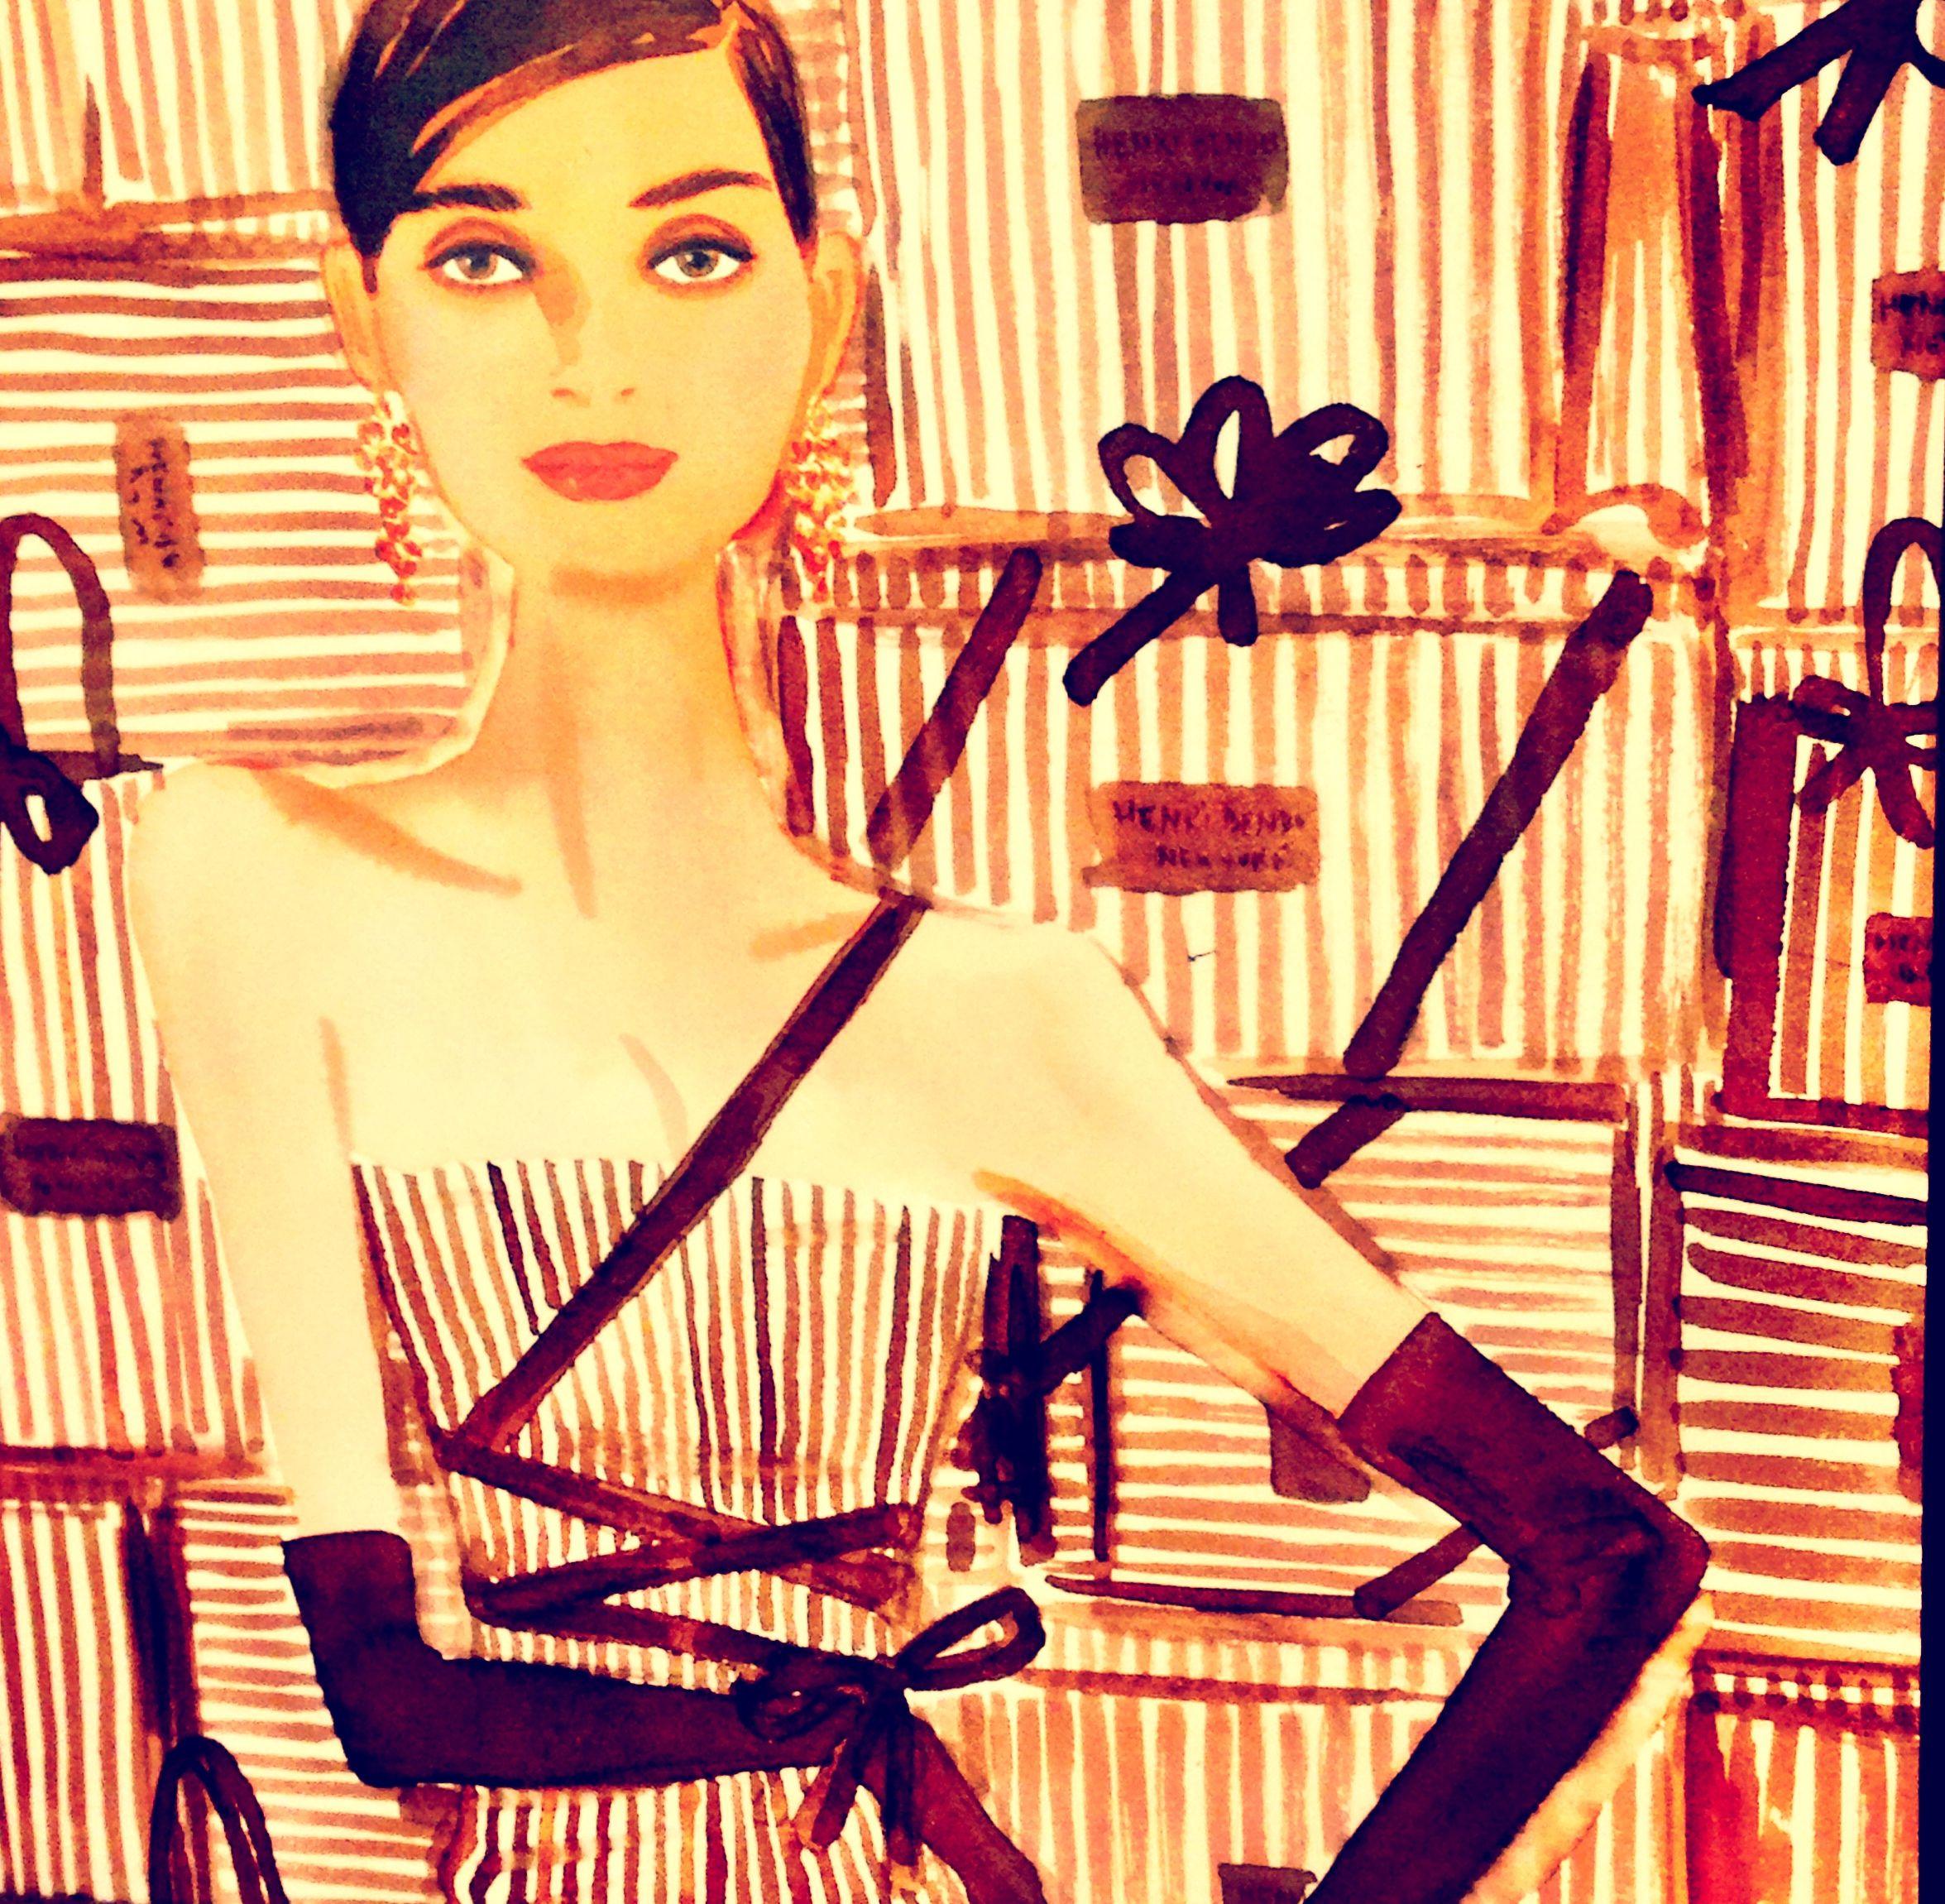 ❤️❤️Henri Bendel #HB Henri Bendel #henribendel #illustrations #wendyheston likes #shopbendel #charmiesbywendy loves #henribendelilustrations